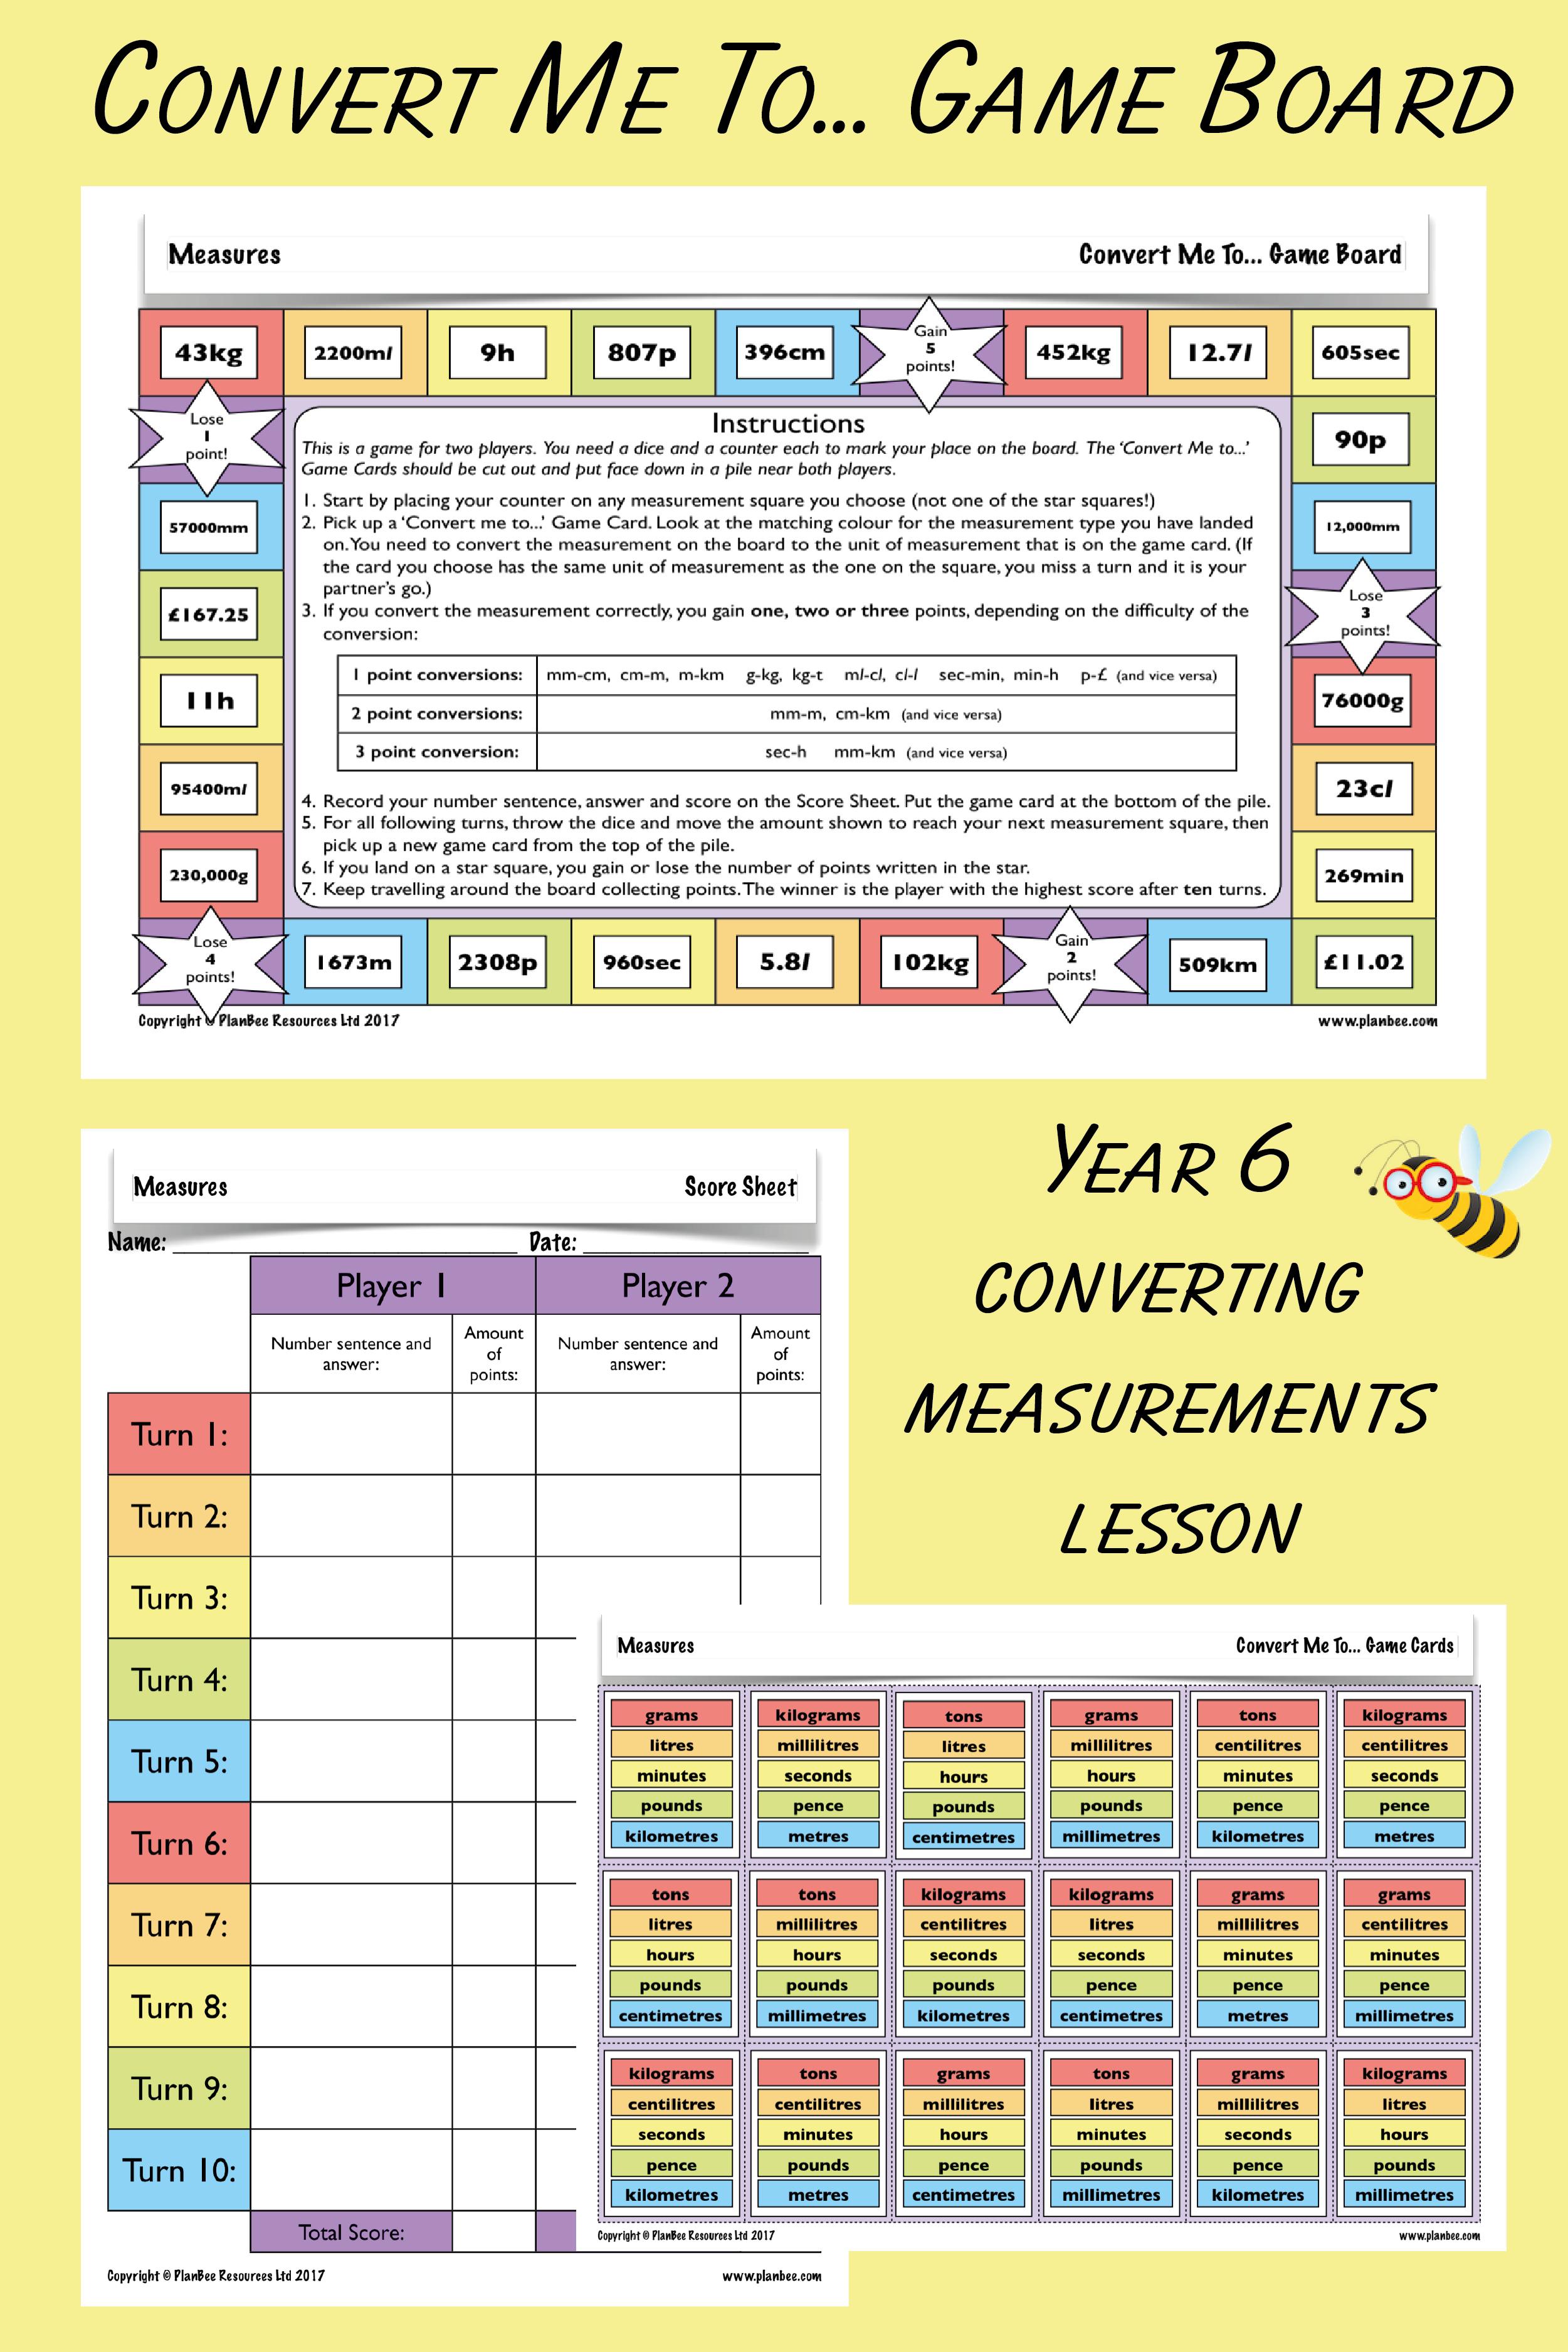 Measures Converting Measures